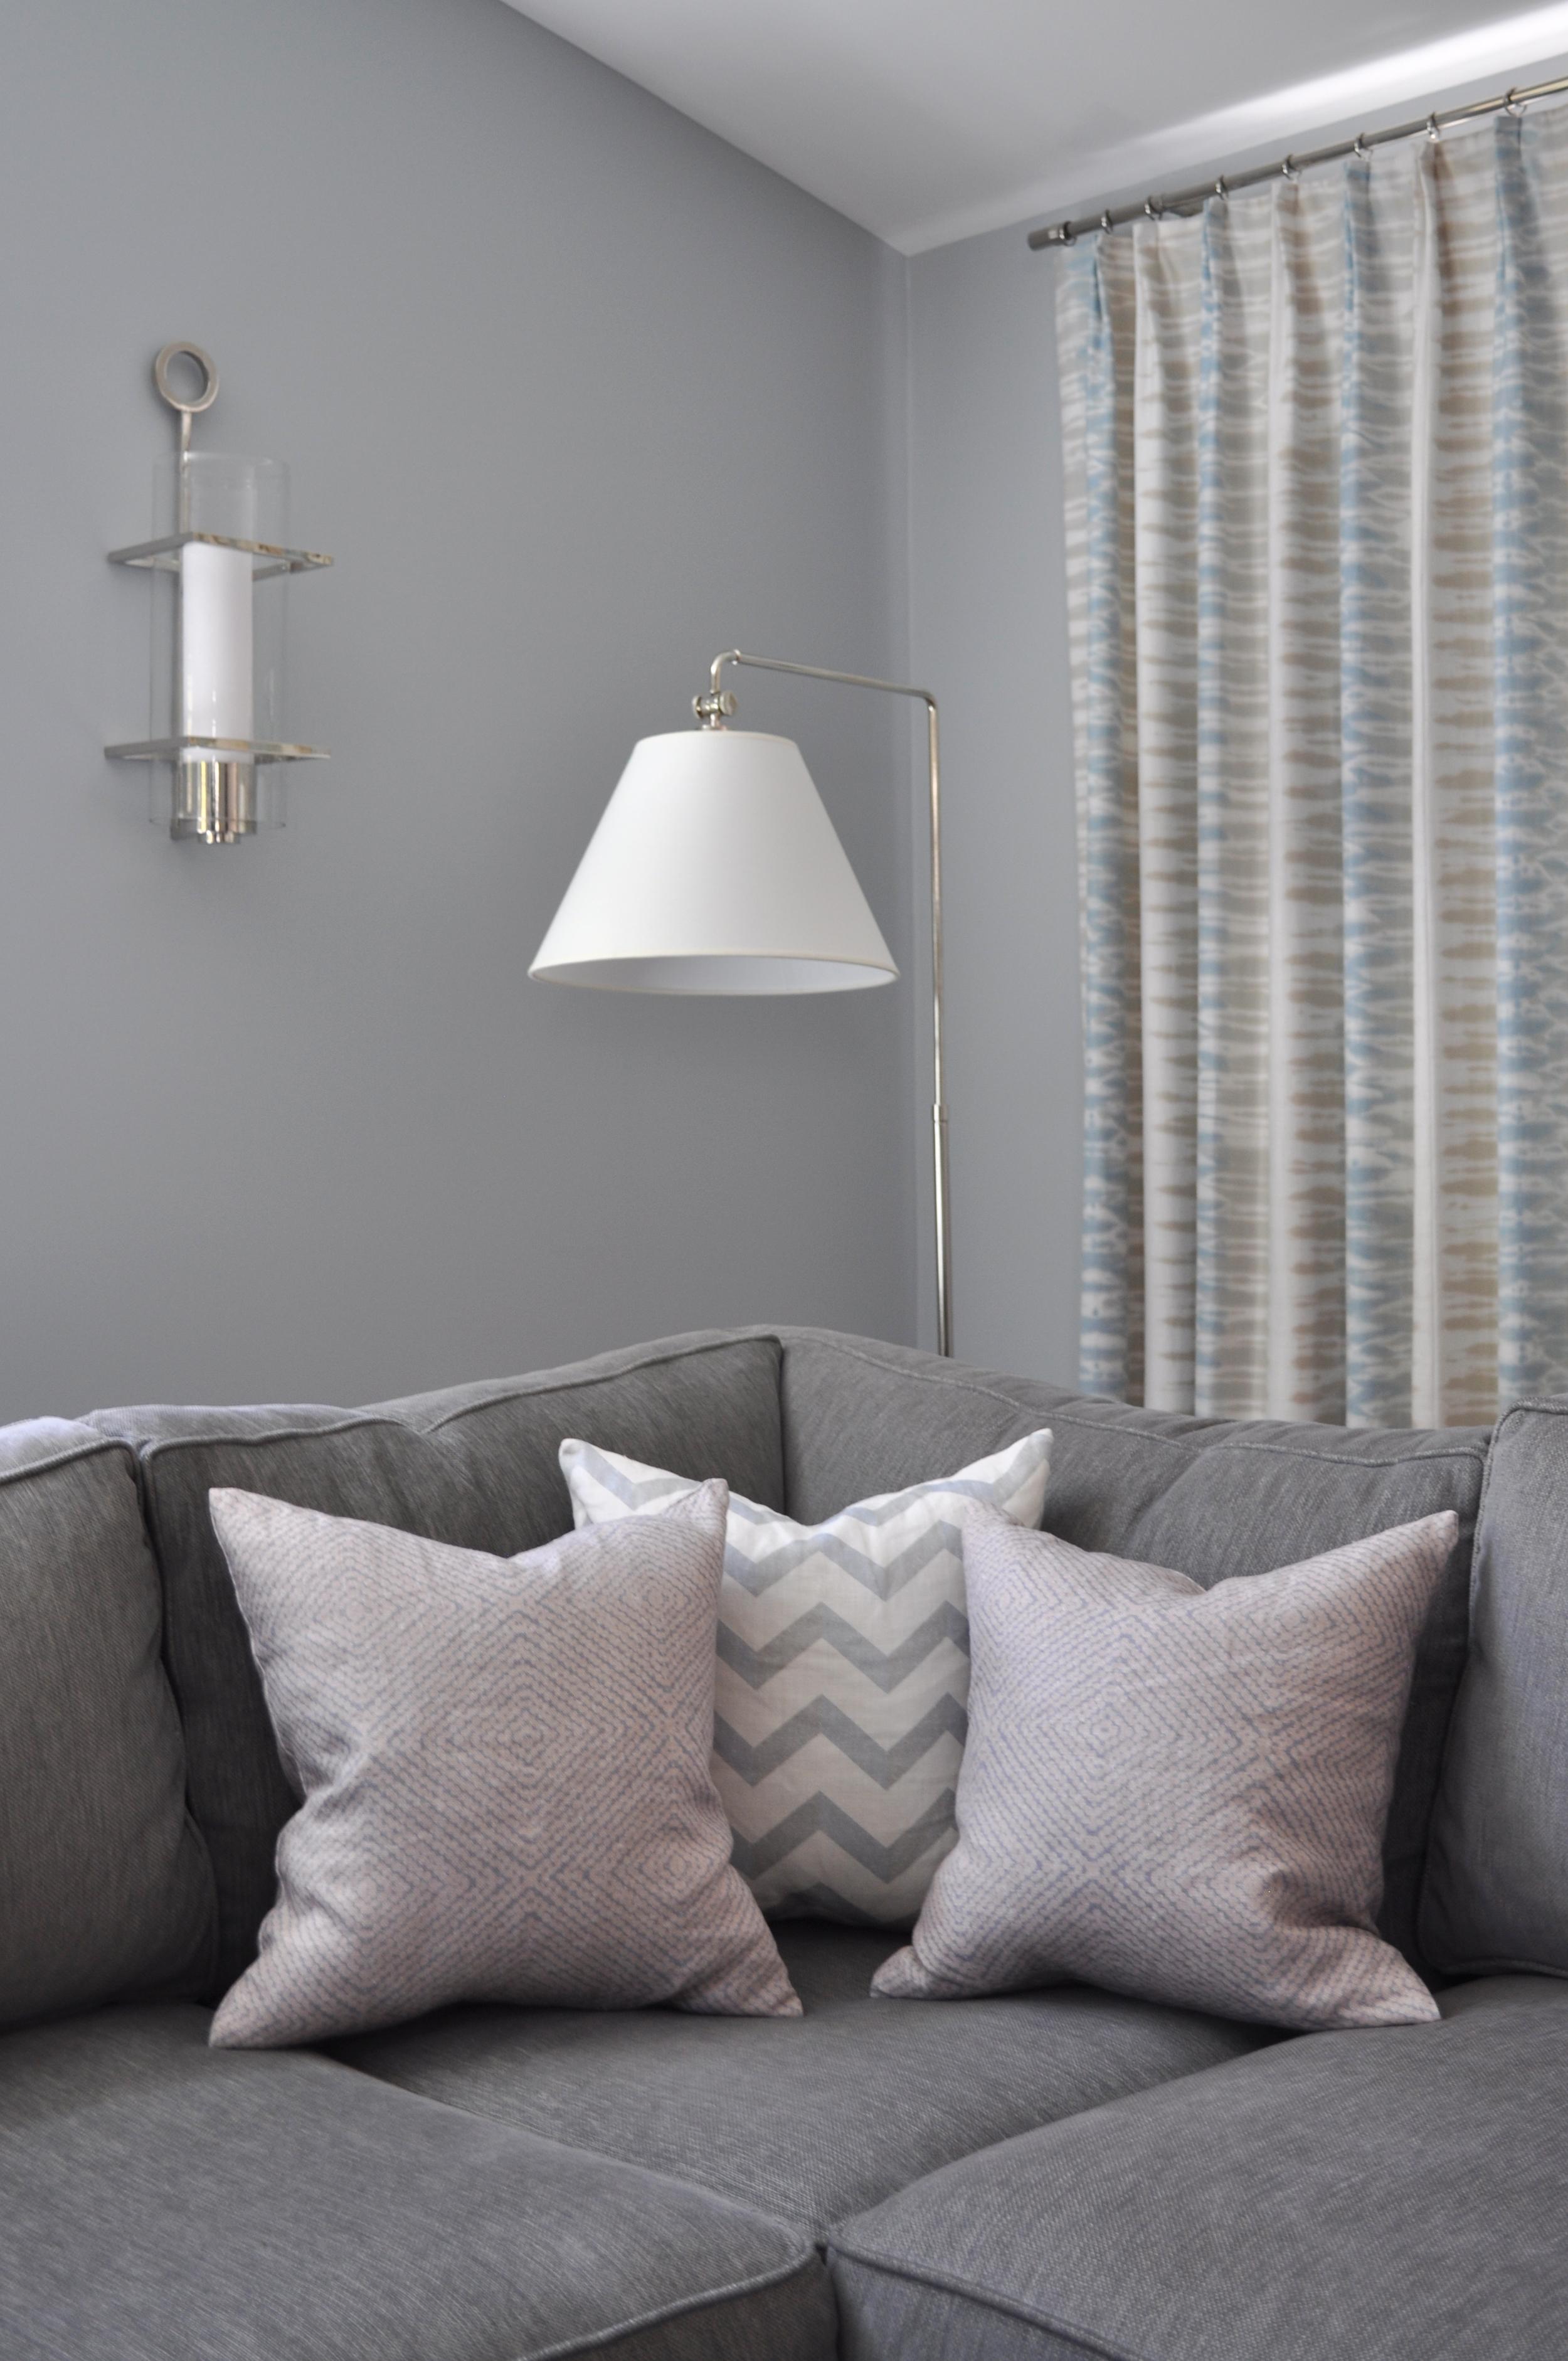 Mamaroneck NY_Contemporary Coastal Family Room_Custom Pillows_Kravet Fabric Custom Drapery_Ralph Lauren Standing Lamp_Interior Designer Kim A Mitchell_KAM DESIGN_2016_for Web.jpg